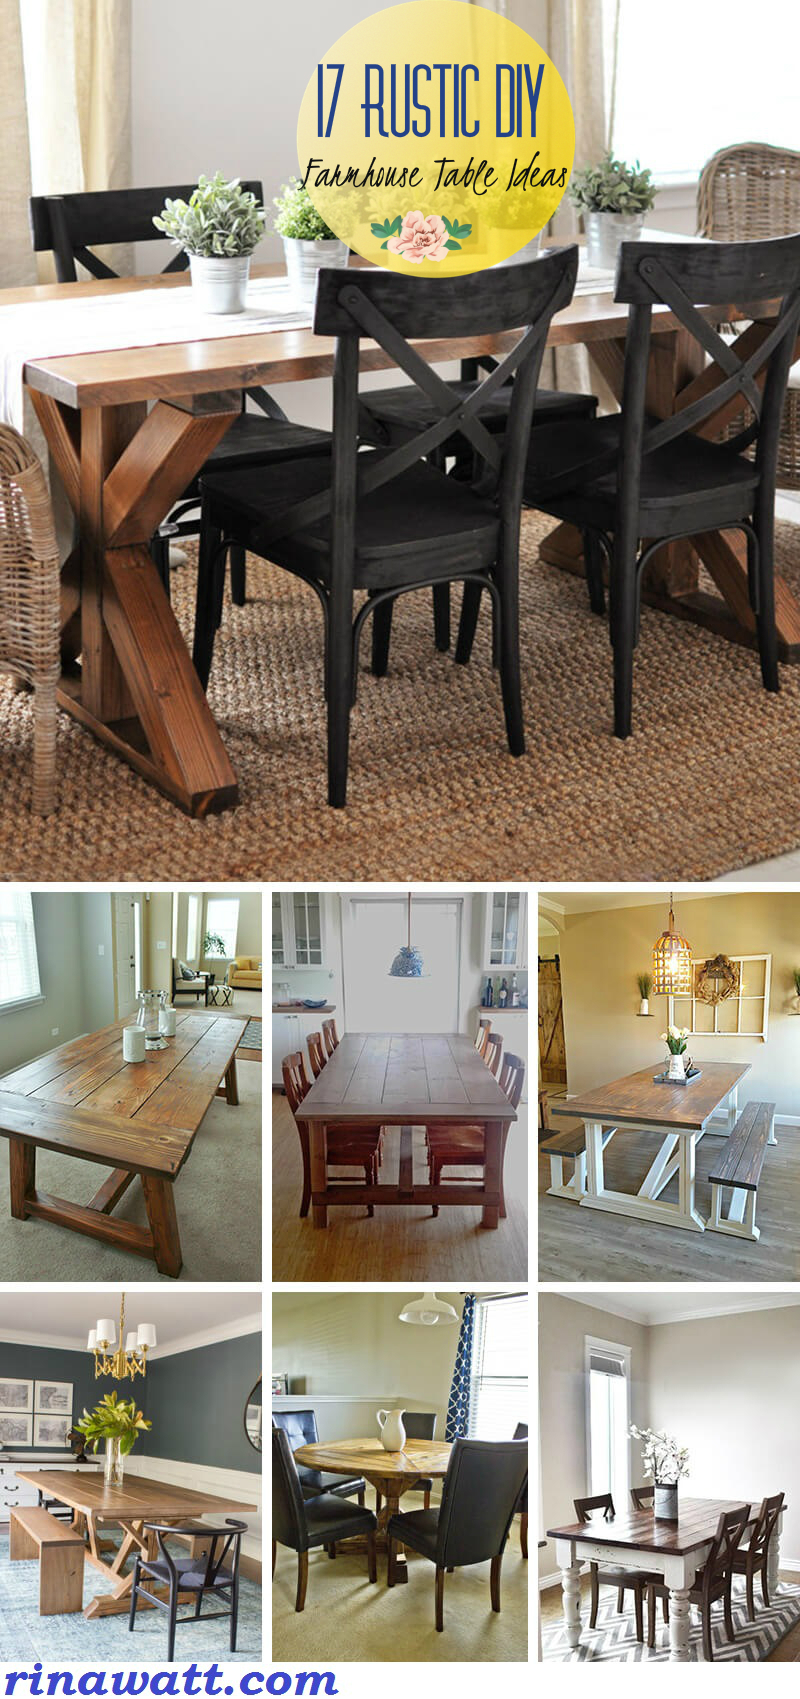 17 Rustic Diy Farmhouse Table Ideas To